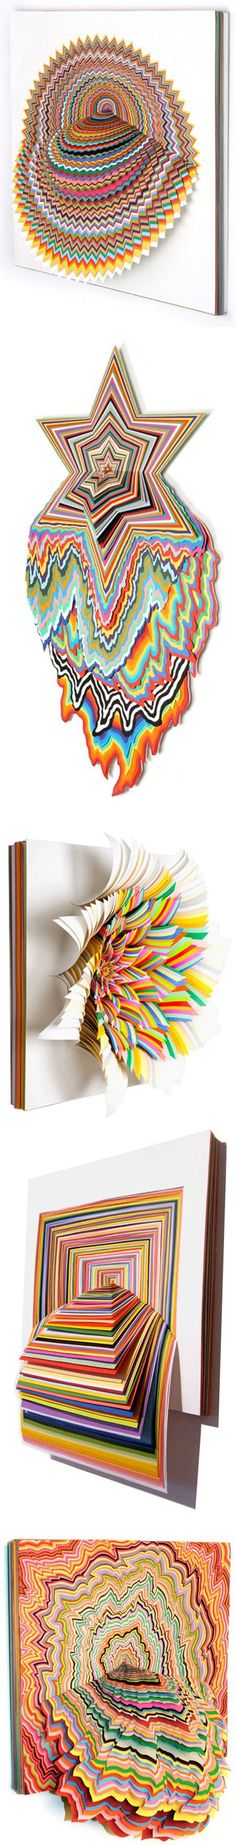 Amazing Paper Craft | DIY & Crafts